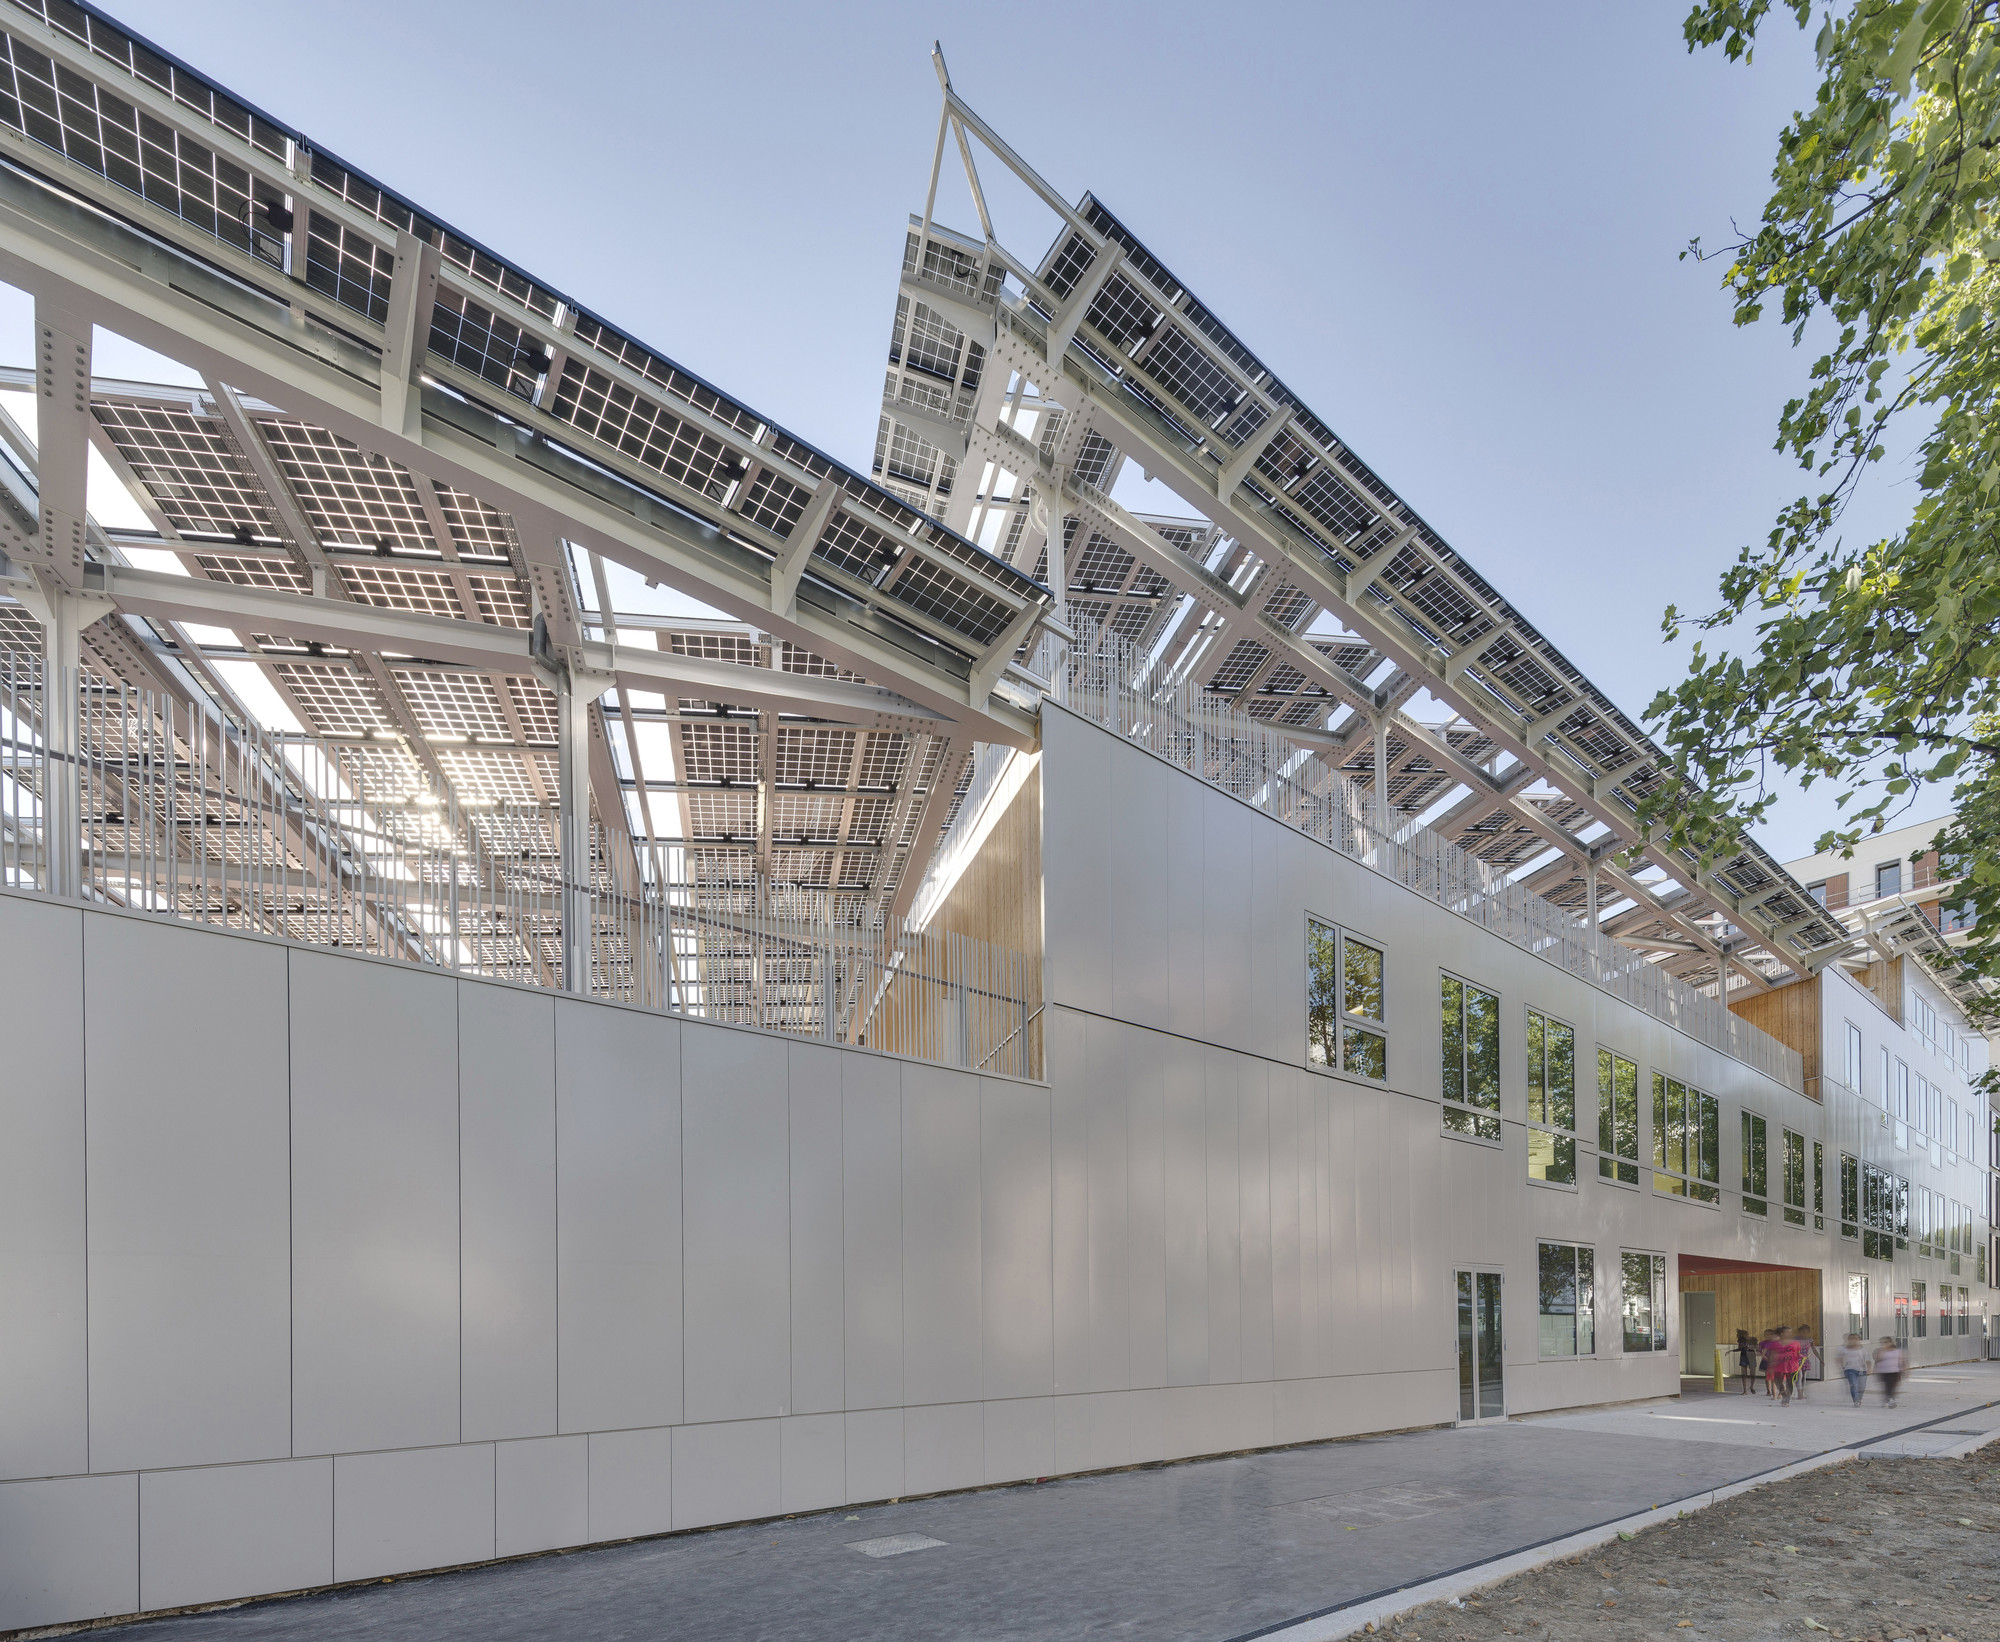 Zero Energy school / Mikou Design Studio, © Florian Kleinefenn